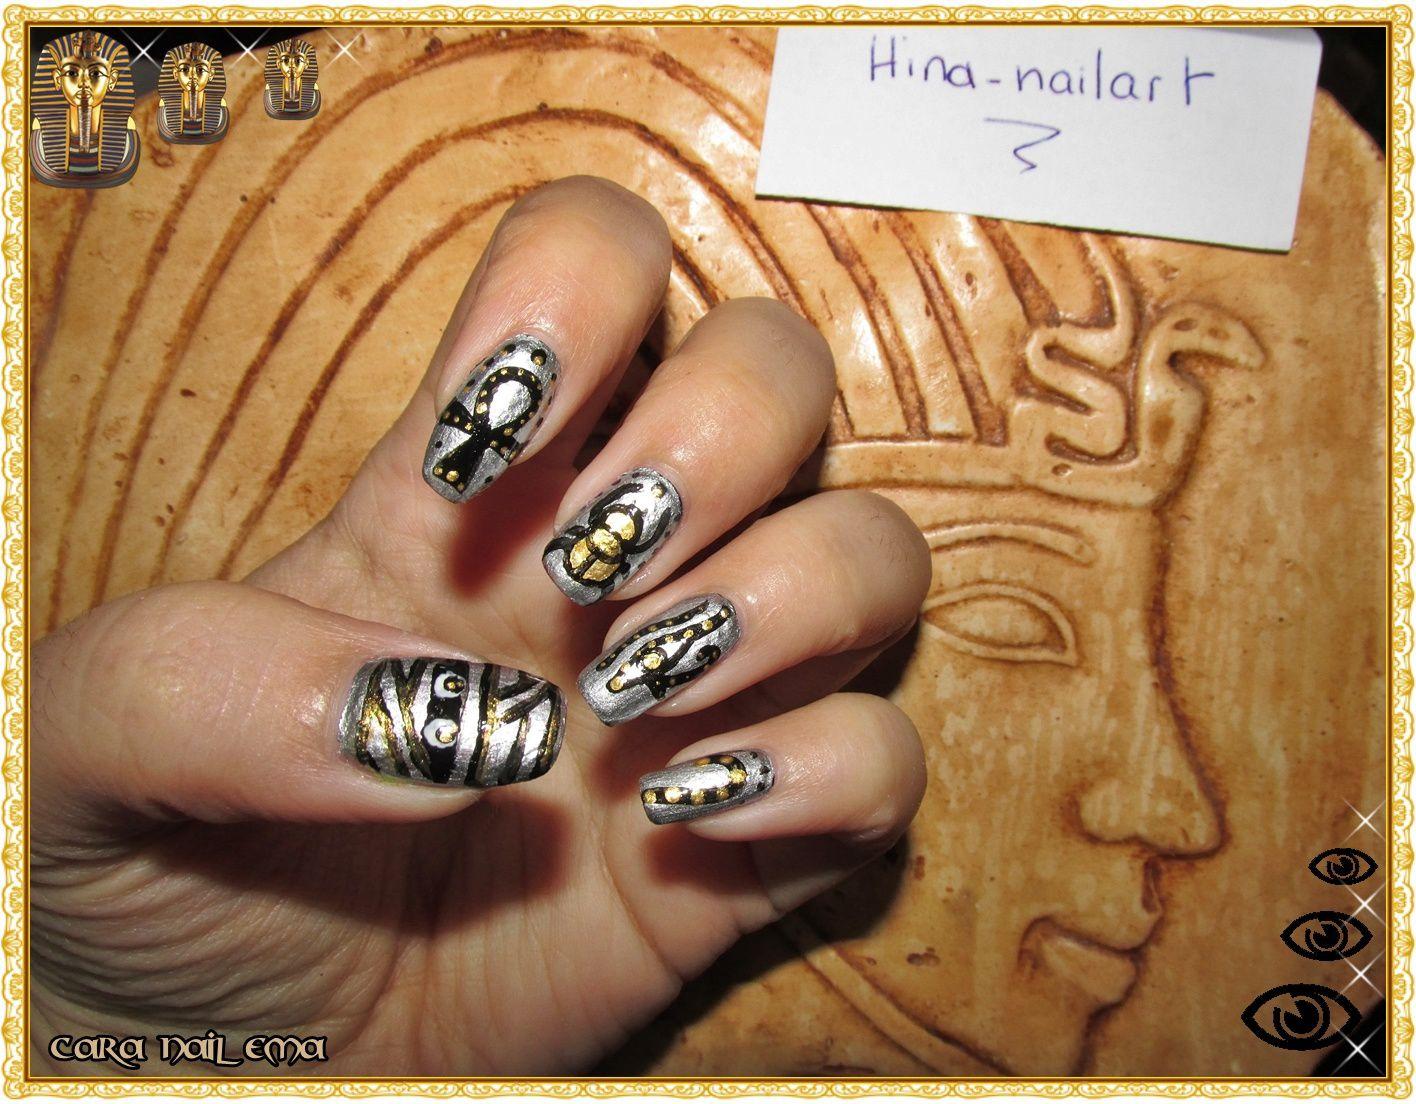 Concours chez Hina nail art - Egypte